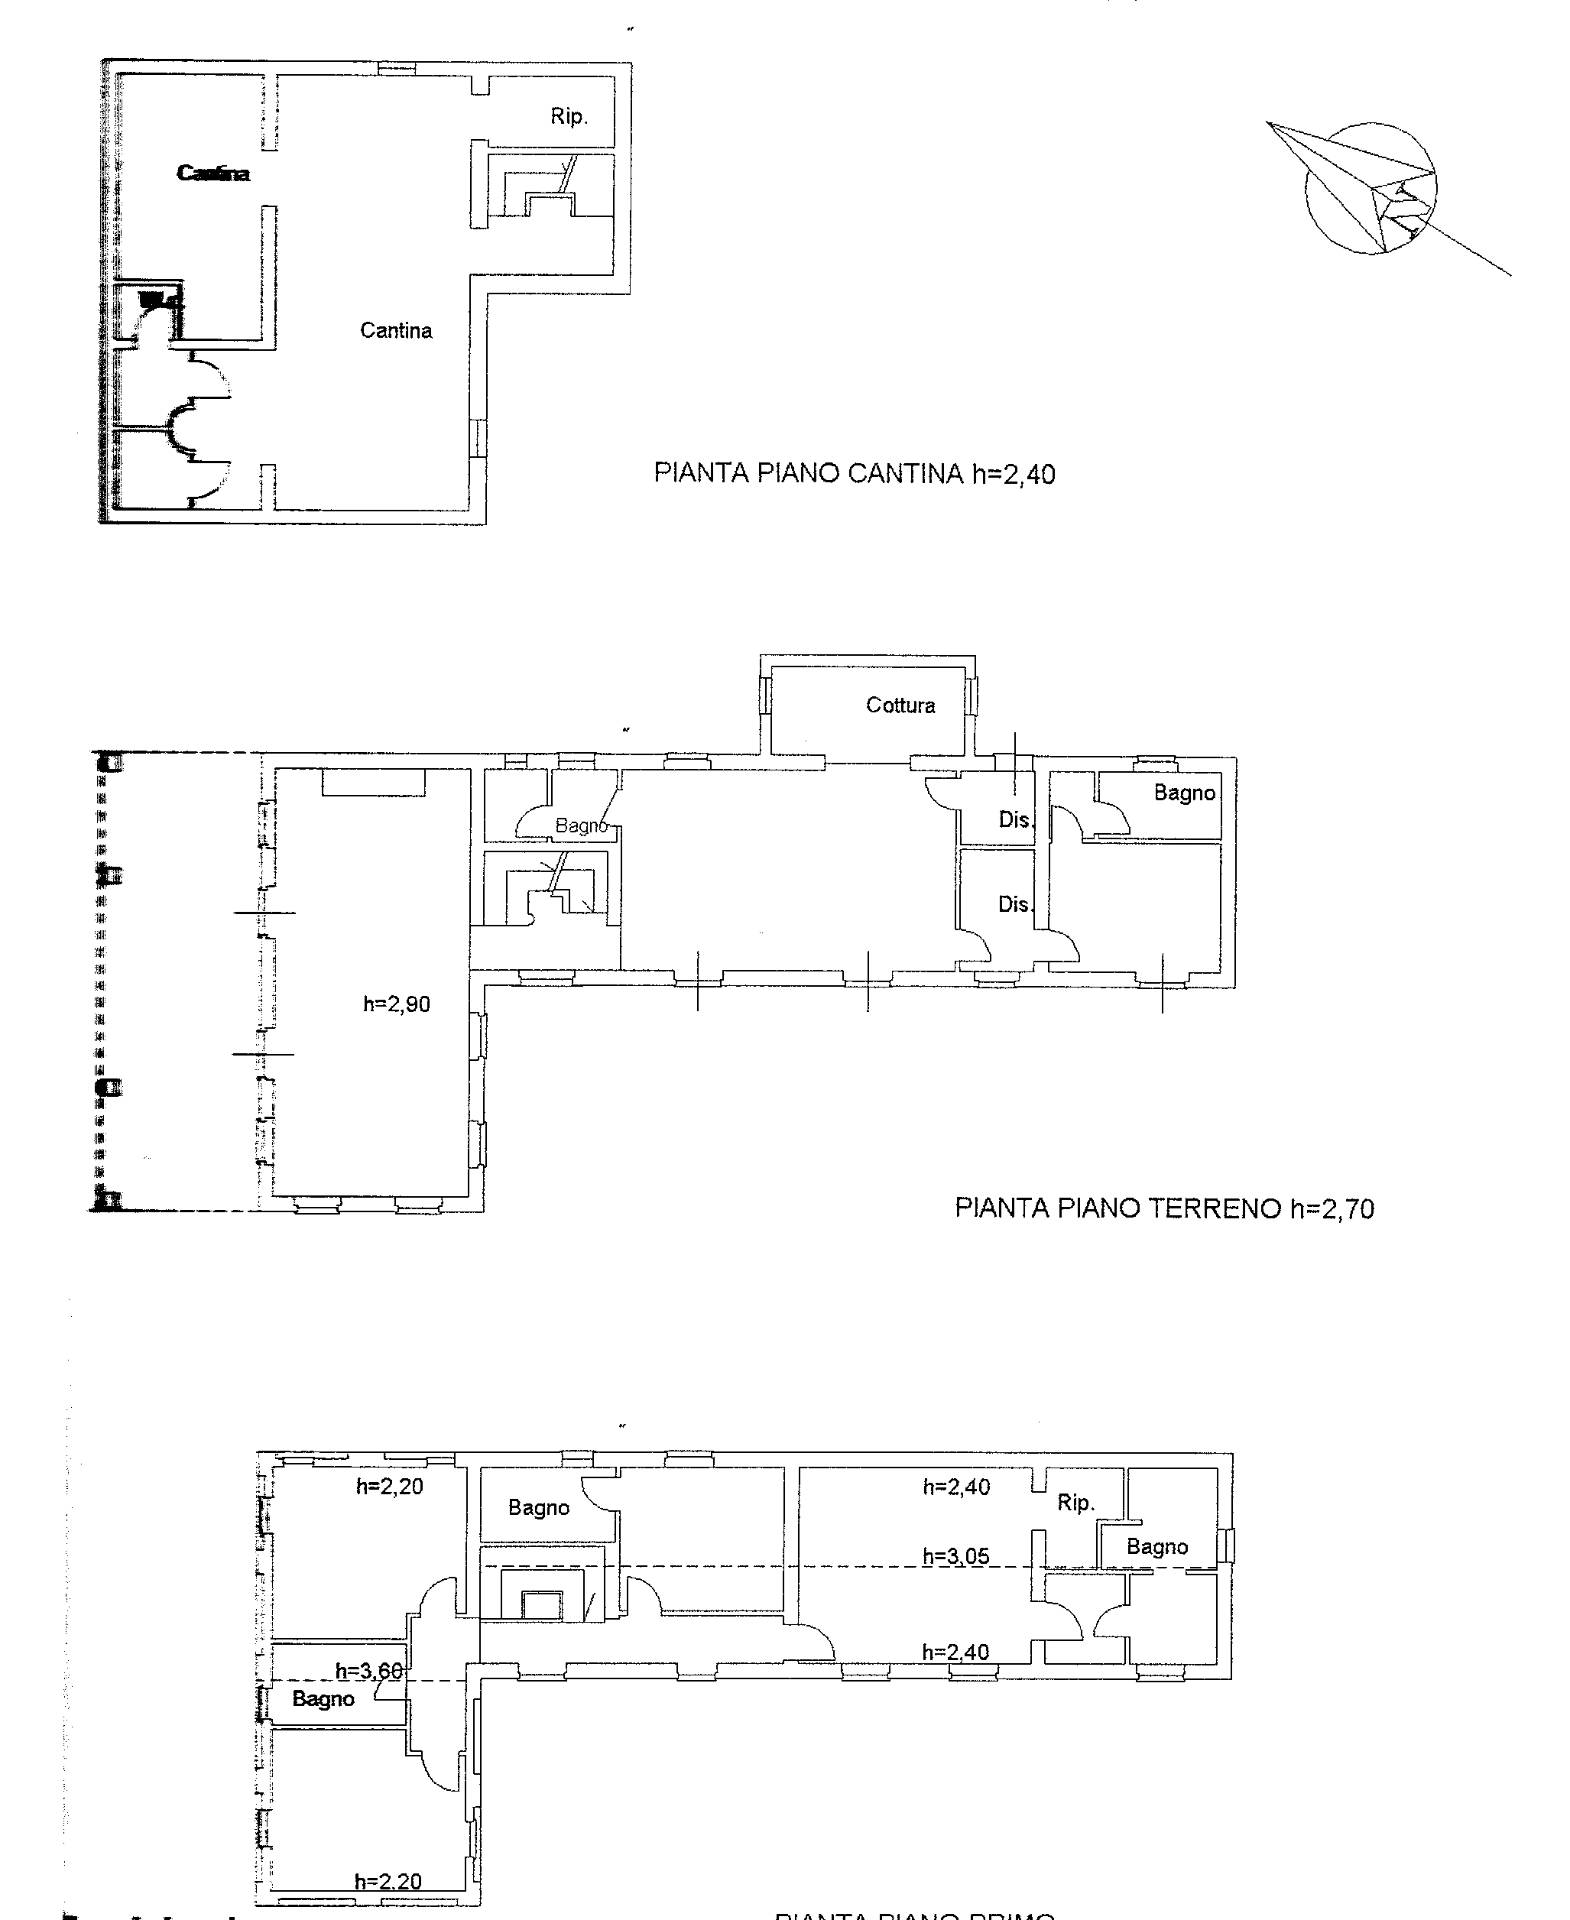 Casa indipendente in Vendita a Massarosa: 5 locali, 350 mq - Foto 13